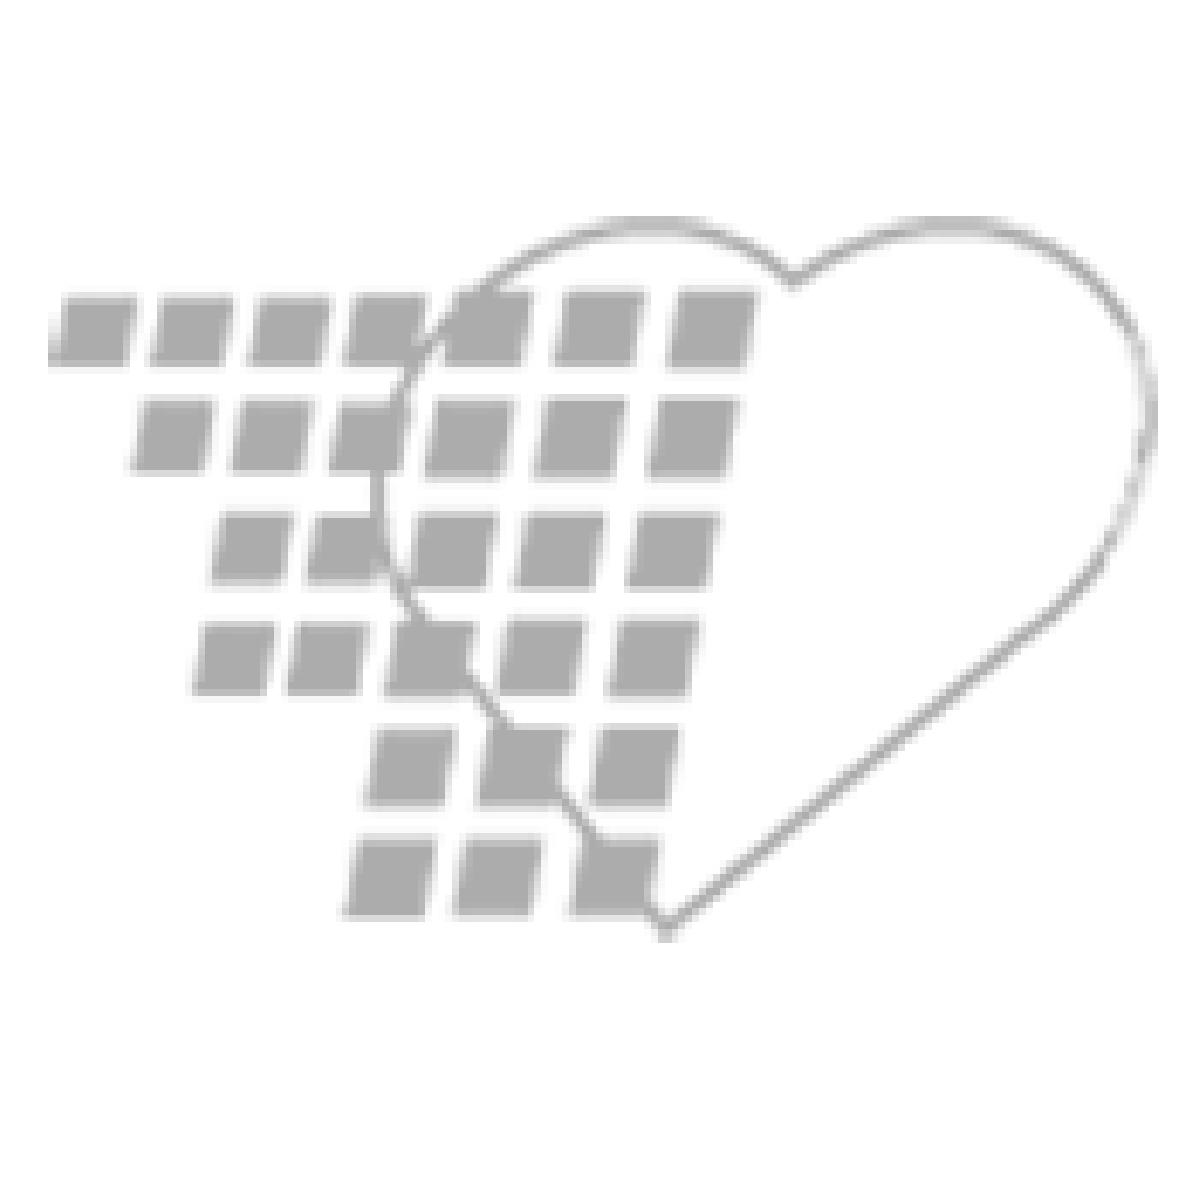 c14eea6cb5b 05-84-1001 Pocket Nurse® Bath Towel Each Natural 20